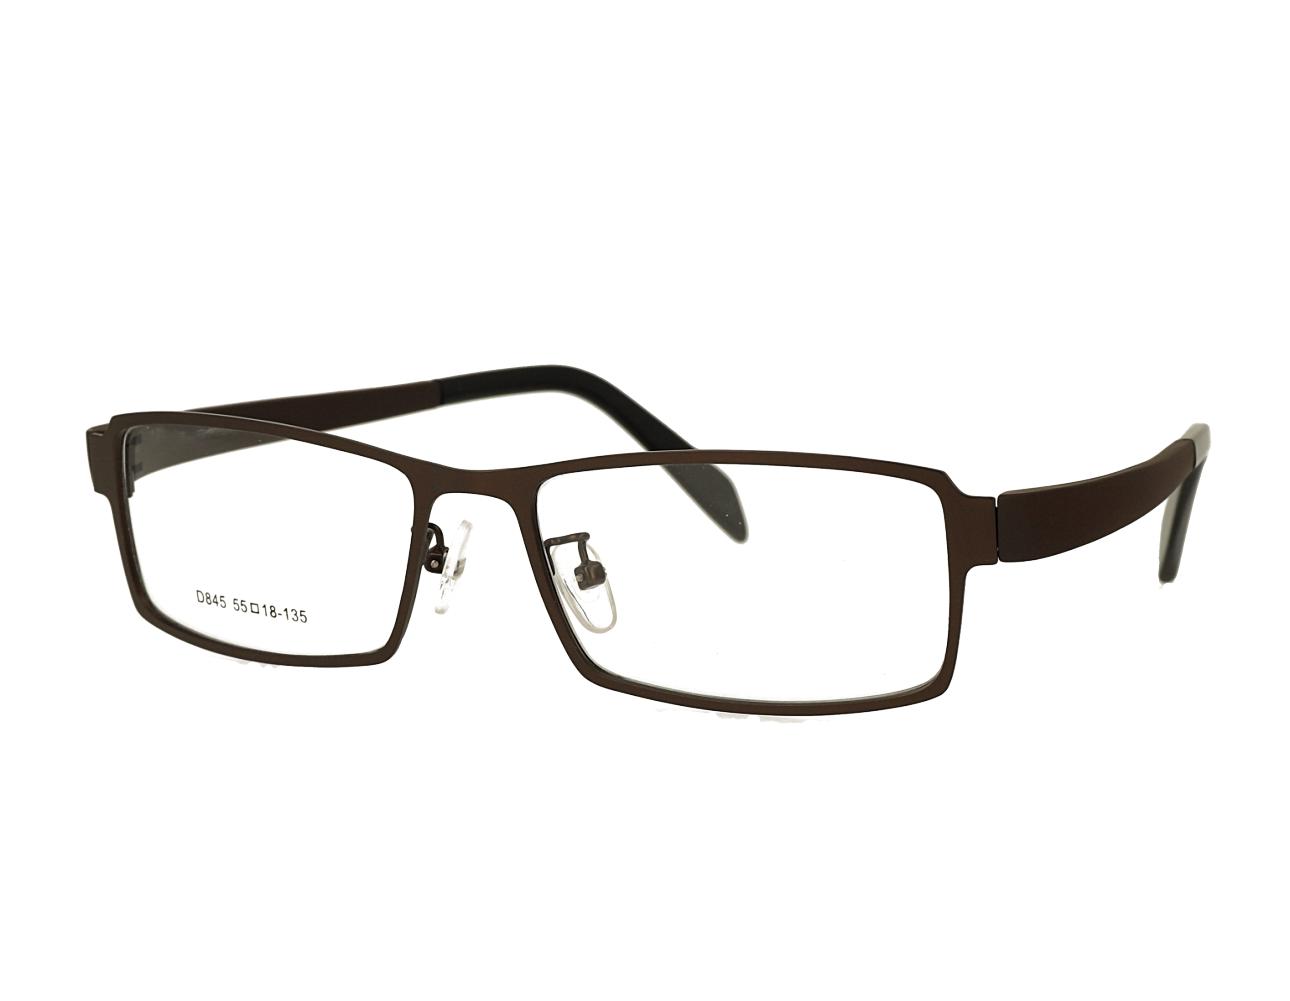 Square Mans designer metal eyewear with TR90 temples